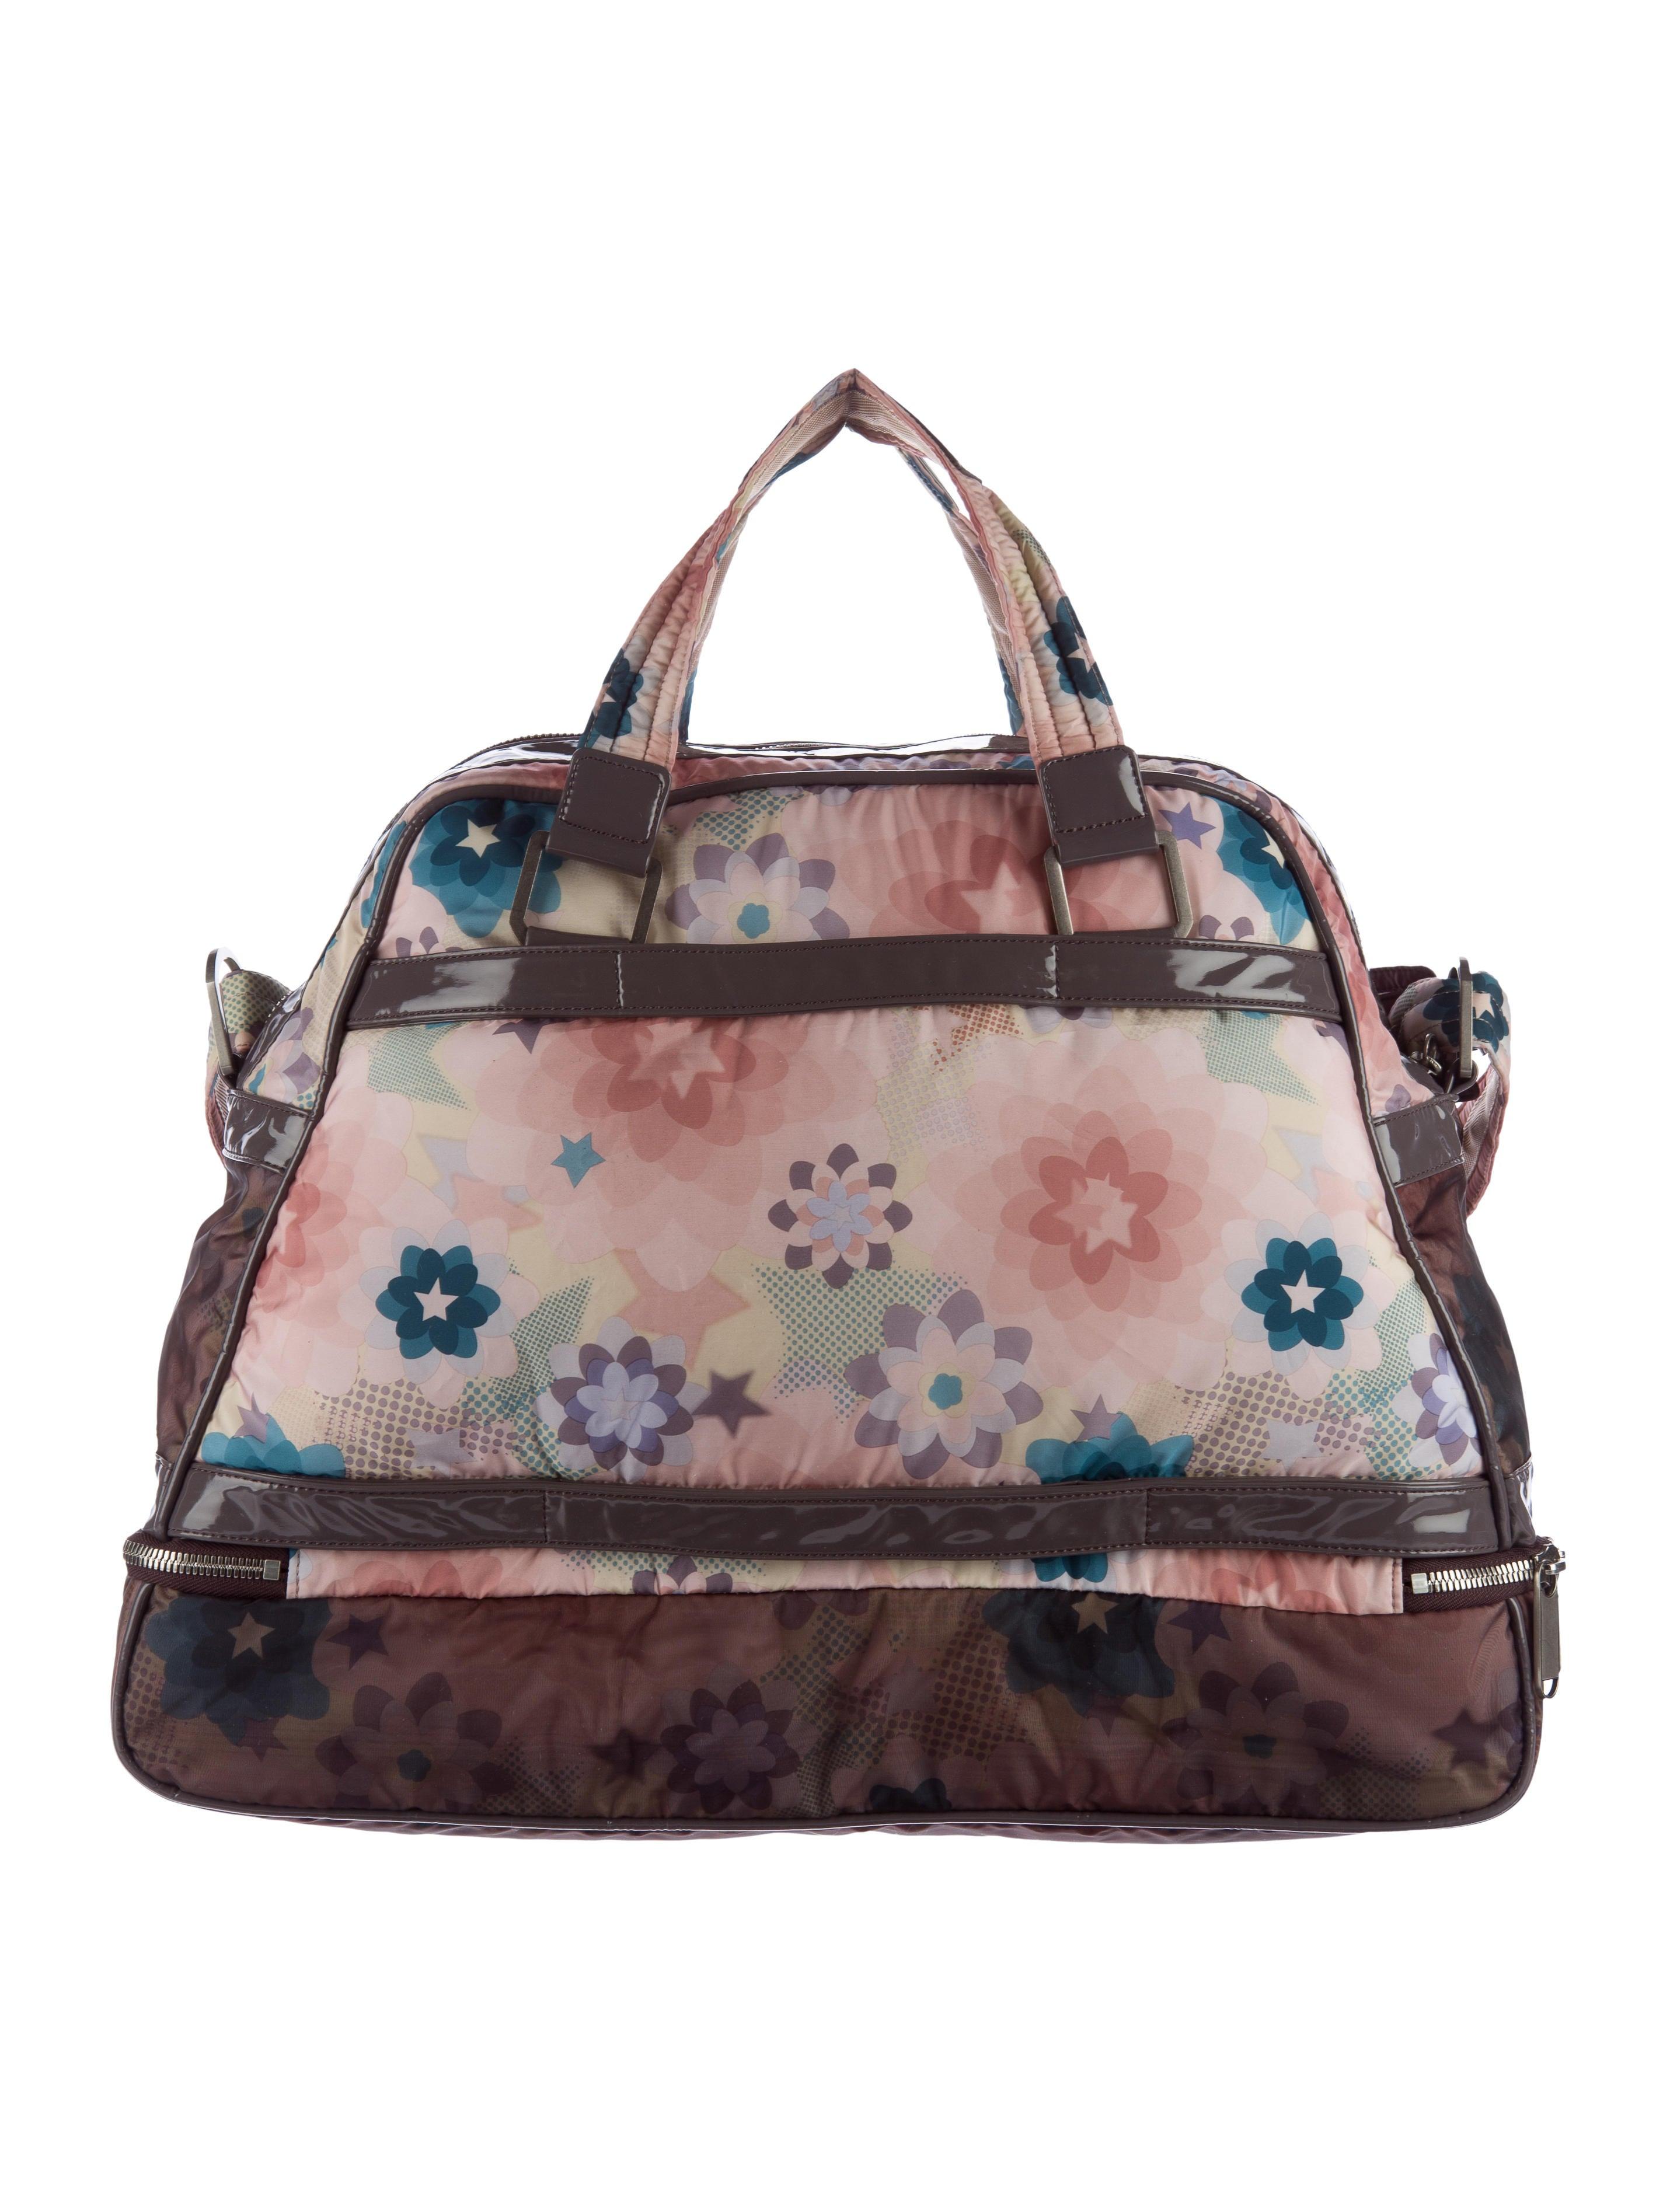 stella mccartney floral print nylon diaper bag handbags stl49395 the realreal. Black Bedroom Furniture Sets. Home Design Ideas